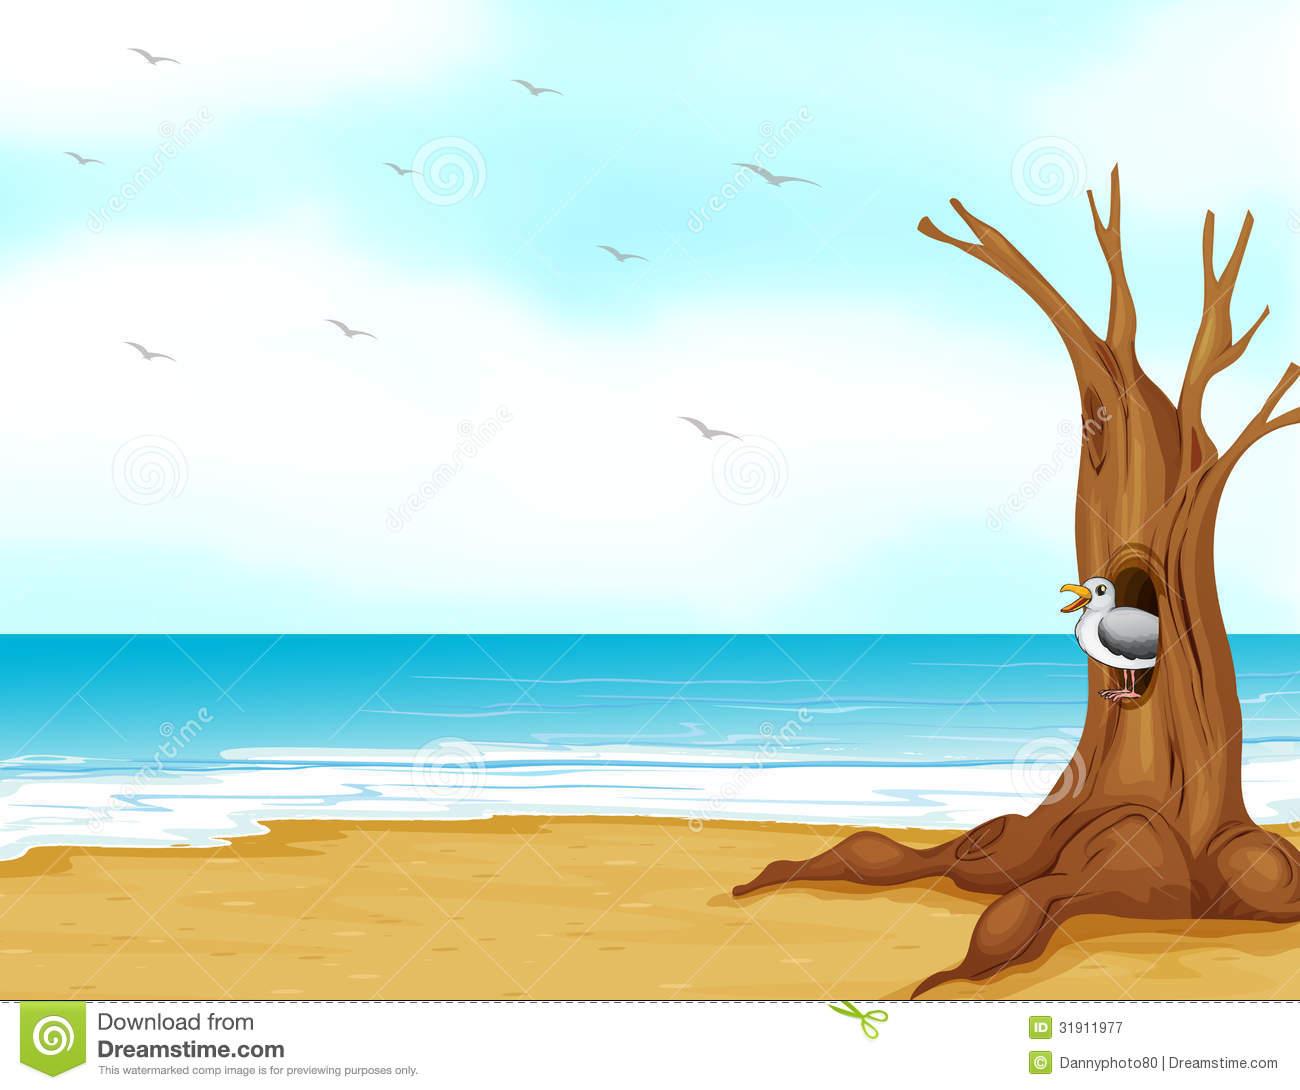 Seashore clipart Download (69+) Group Clip Seashore